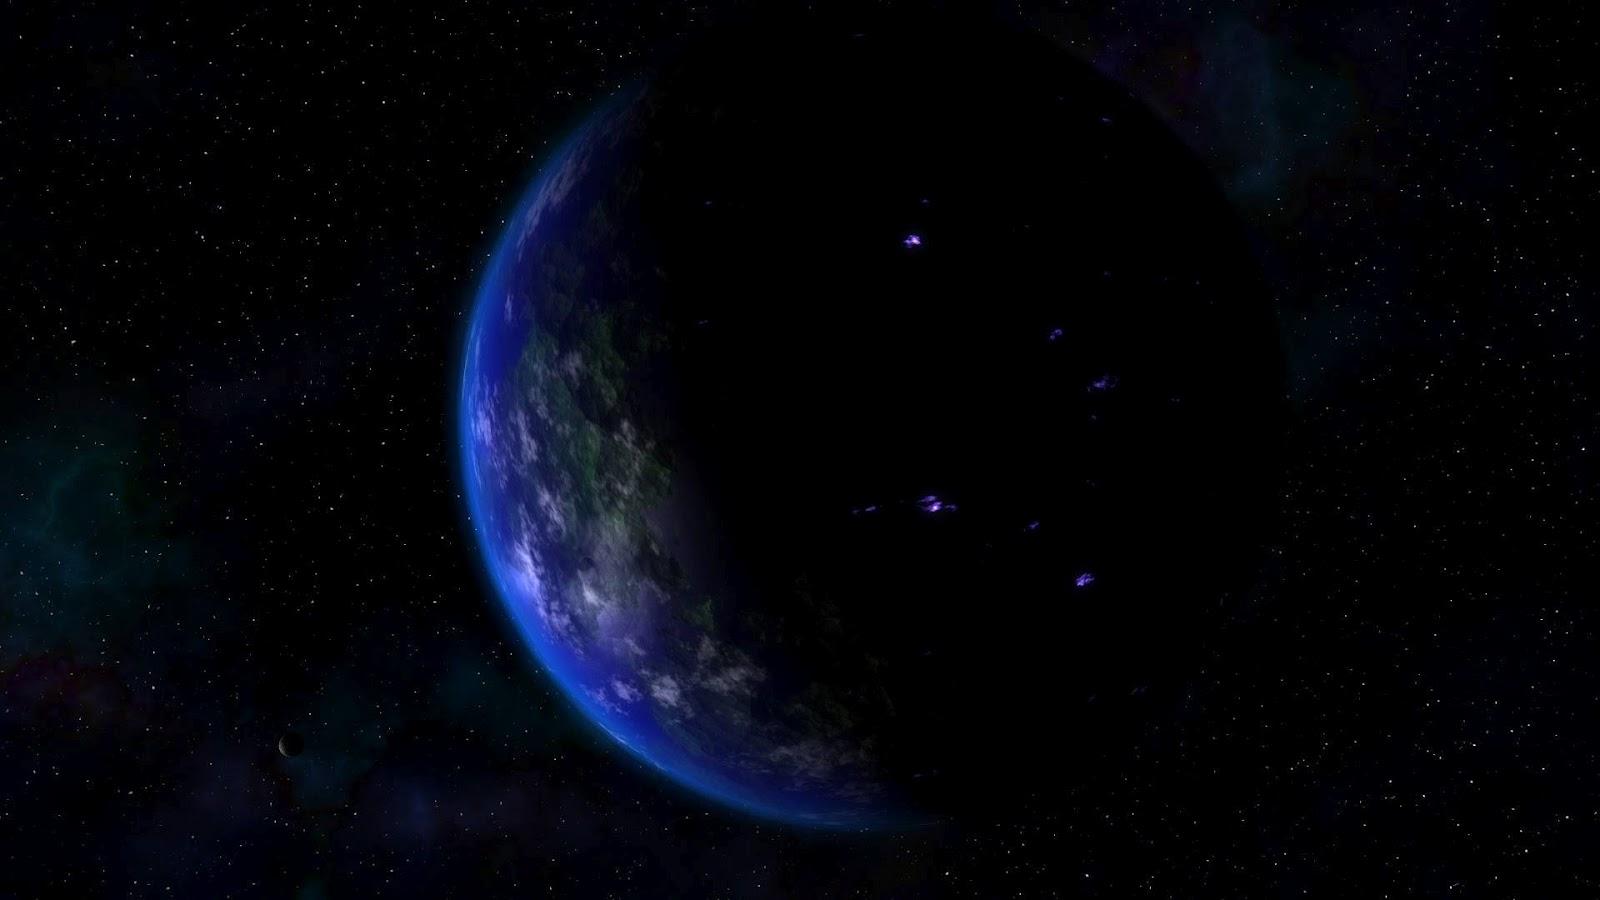 http://4.bp.blogspot.com/-2aC1l_hc99Y/UFFzaPEamEI/AAAAAAAAJ-8/nueh2xCGlTA/s1600/Planeta+Tierra+%5B+Wallpaper+HD+%5D.jpg